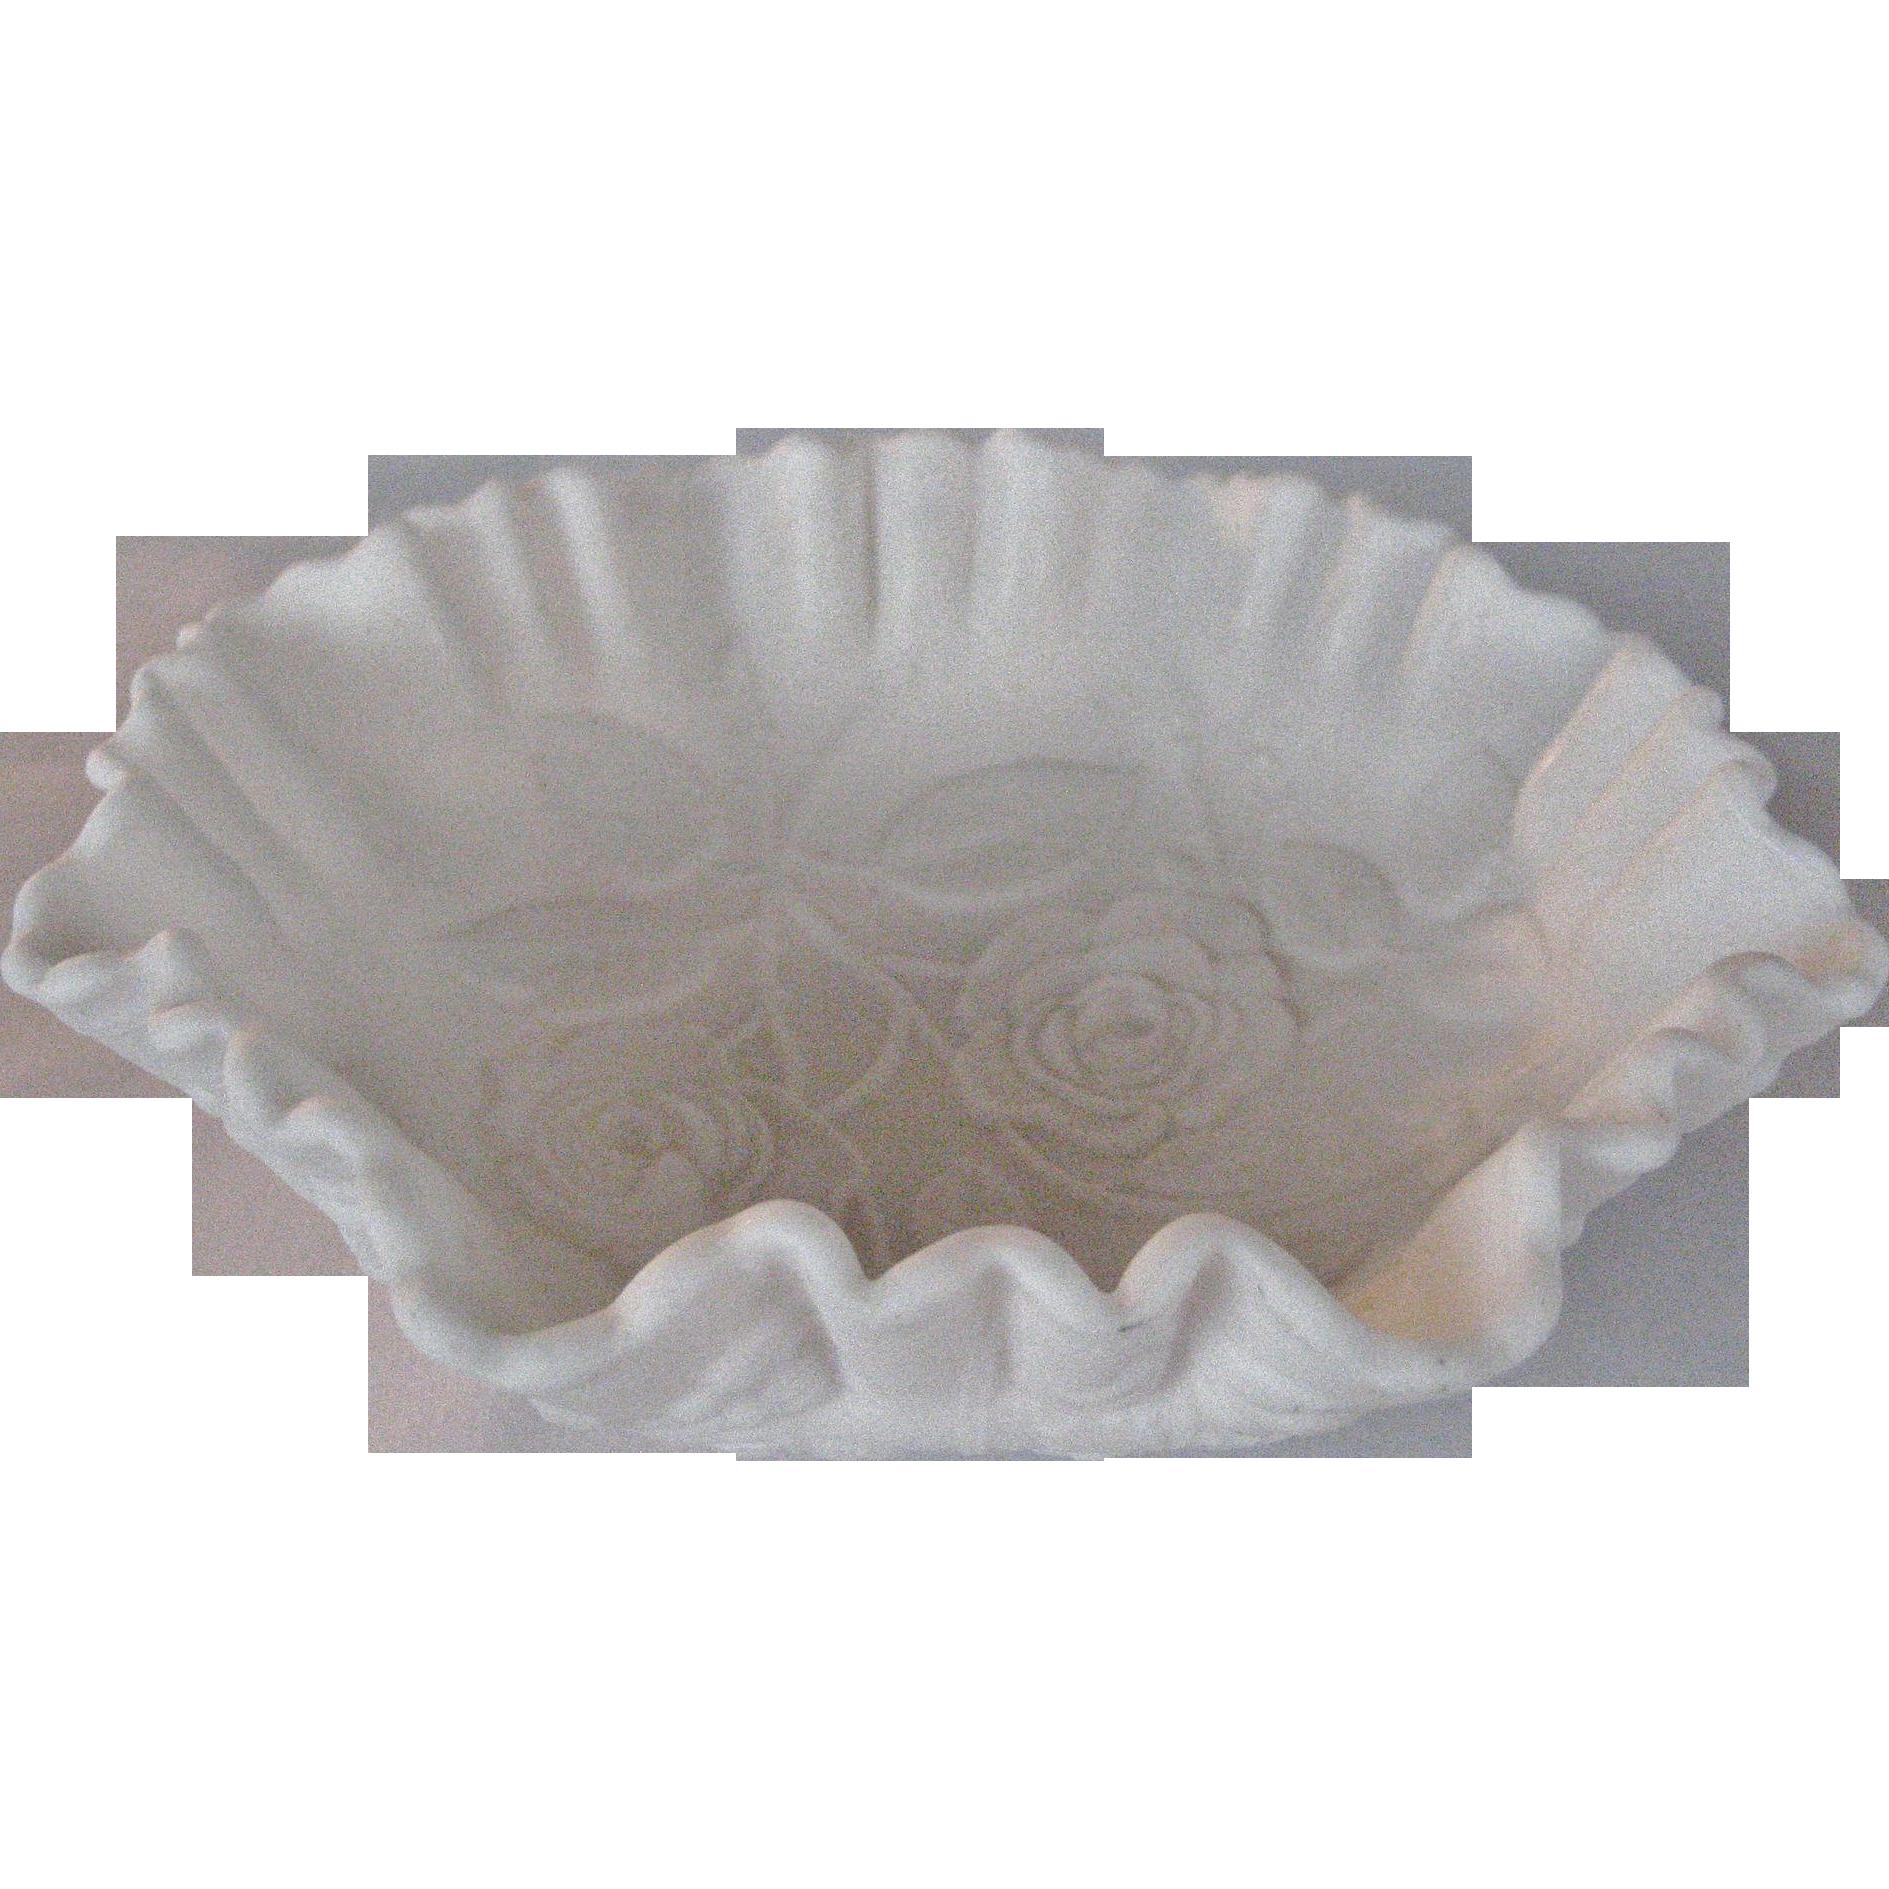 Imperial Glass White Satin Bowl - Roses